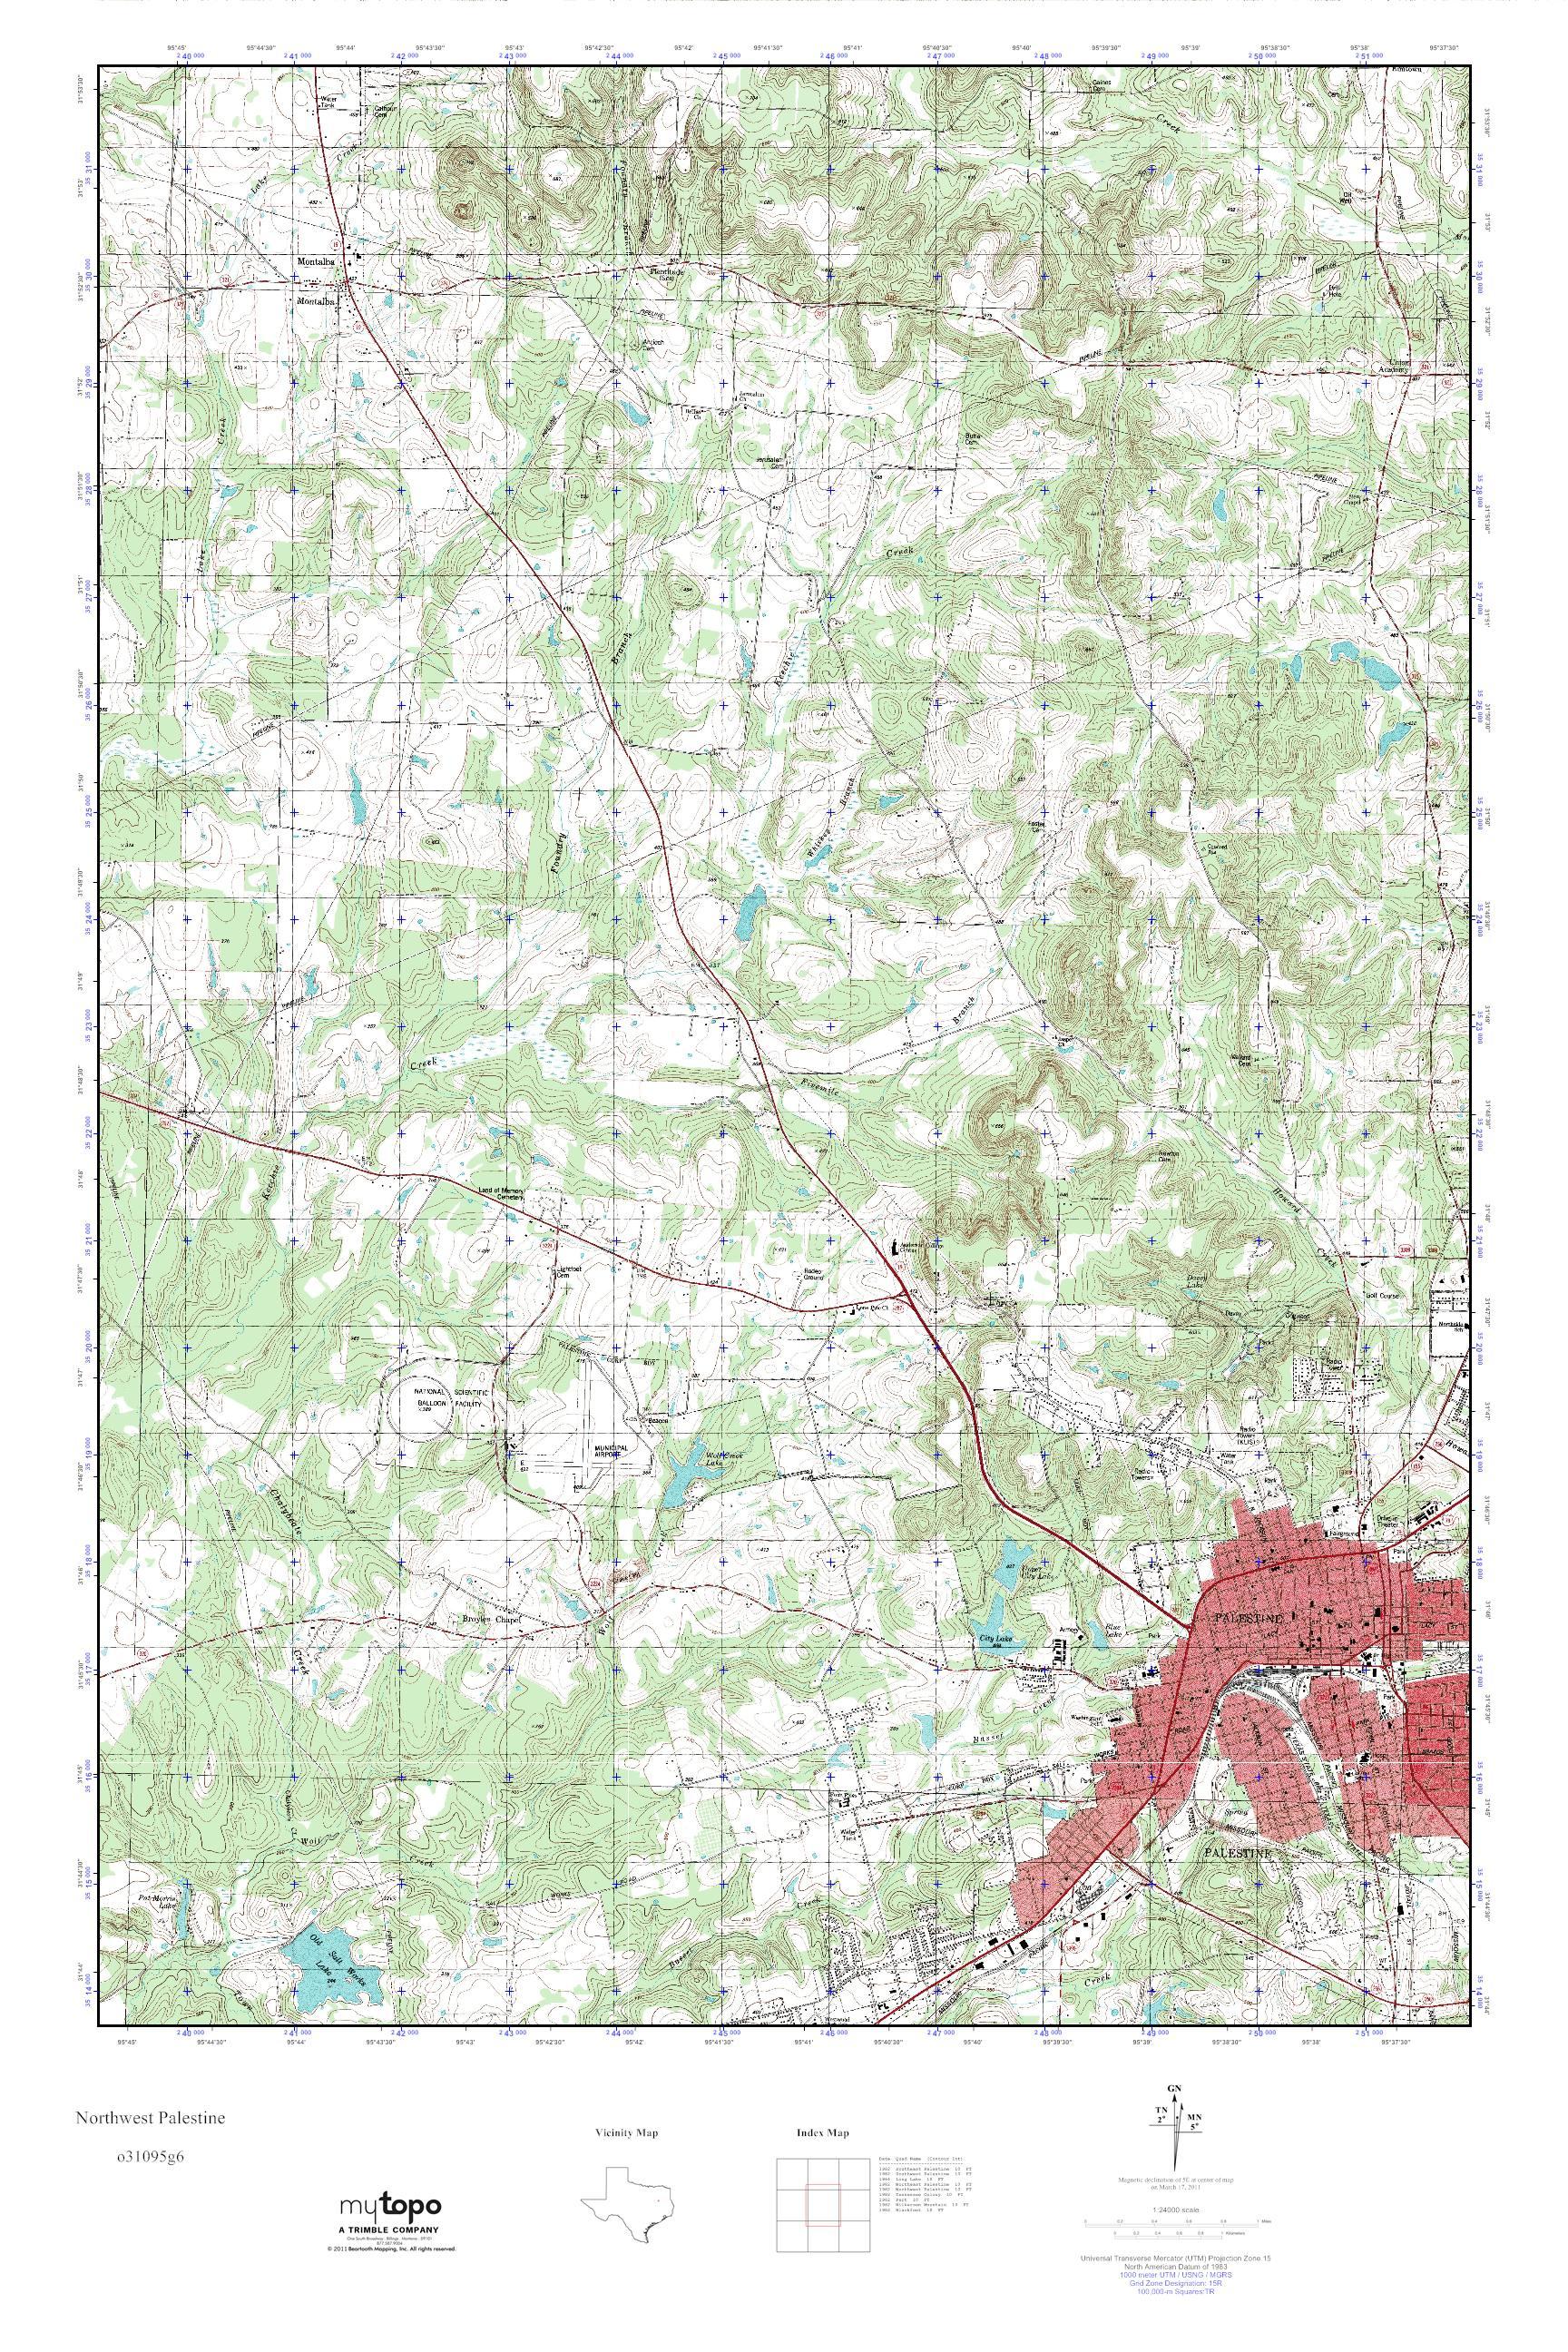 Mytopo Northwest Palestine, Texas Usgs Quad Topo Map - Palestine Texas Map